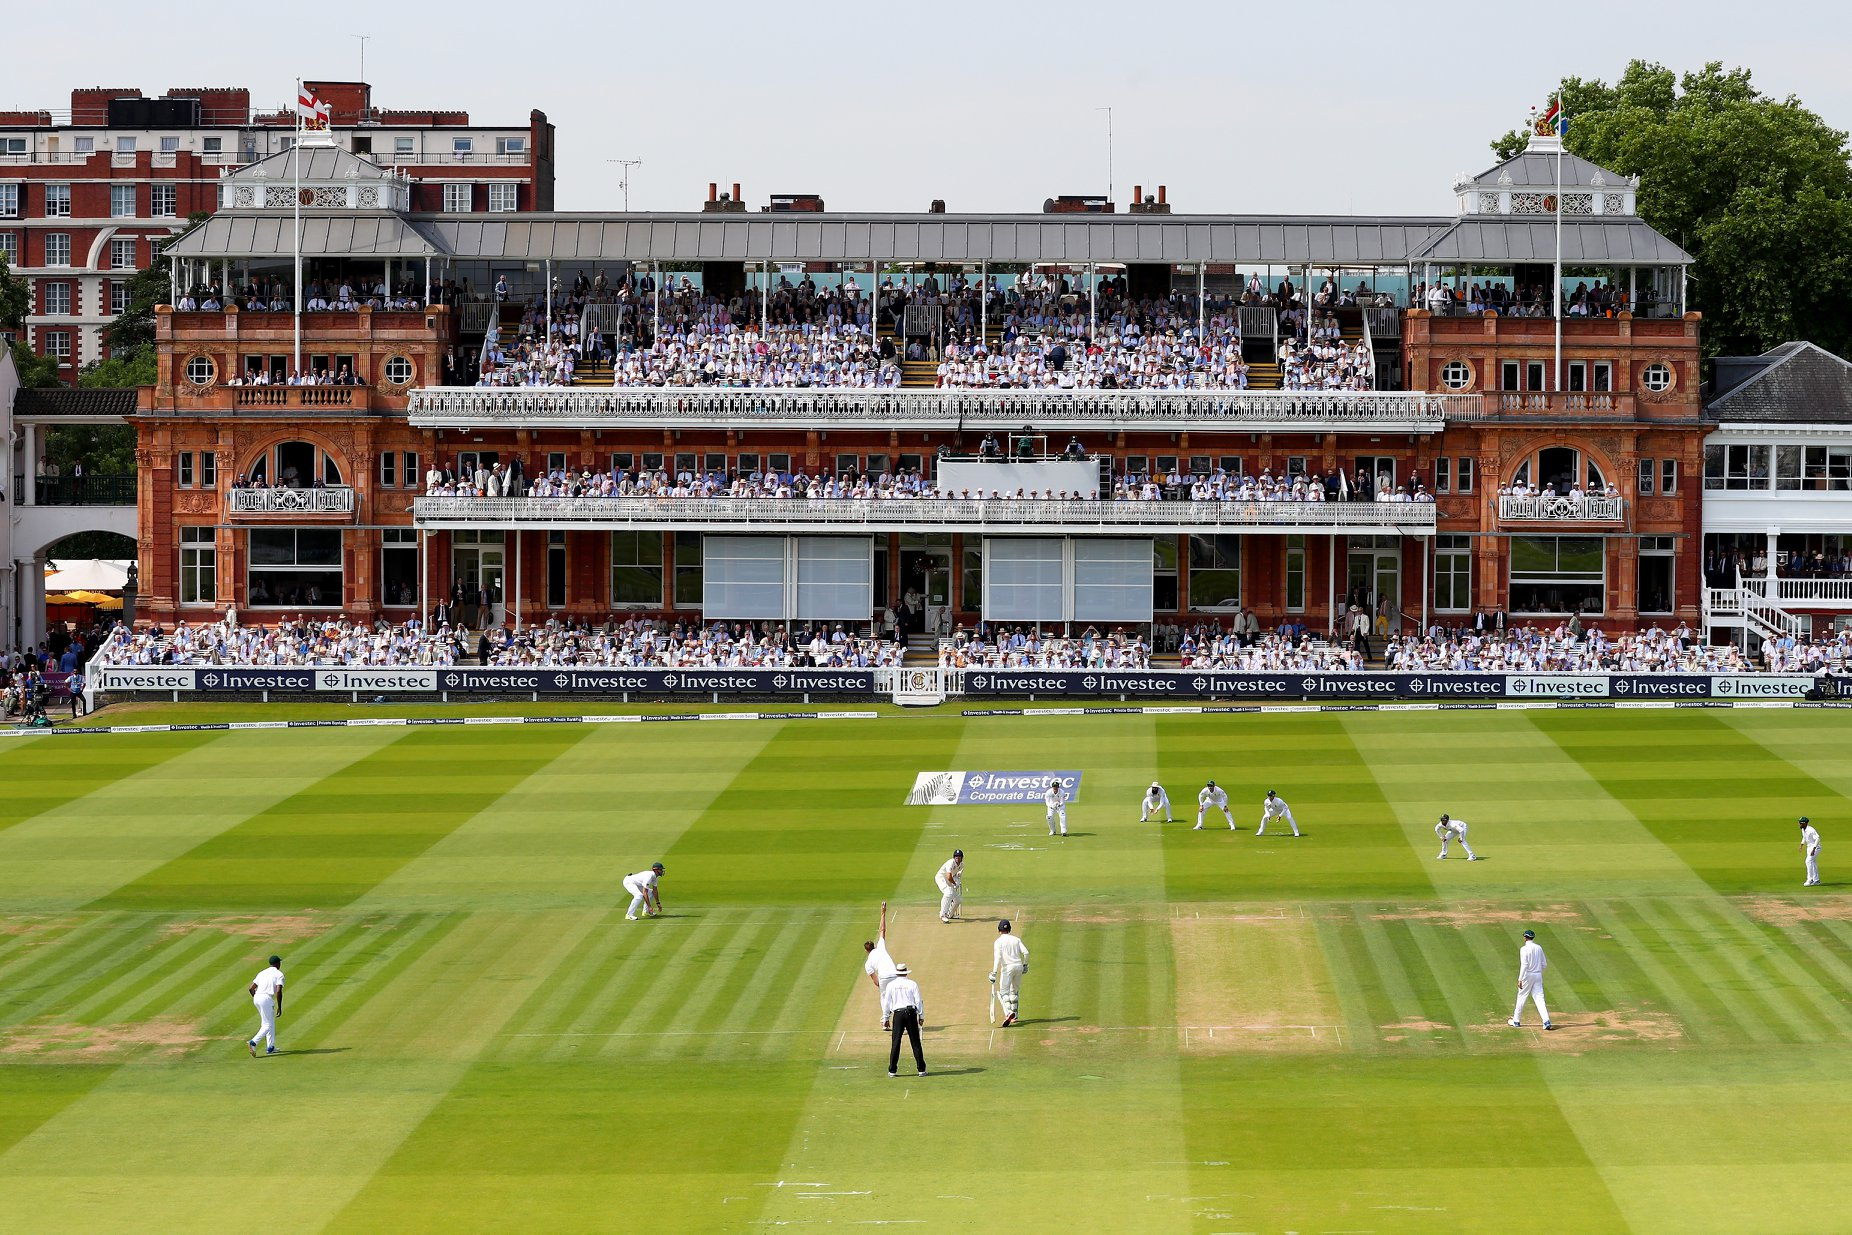 lords cricket ground.jpg